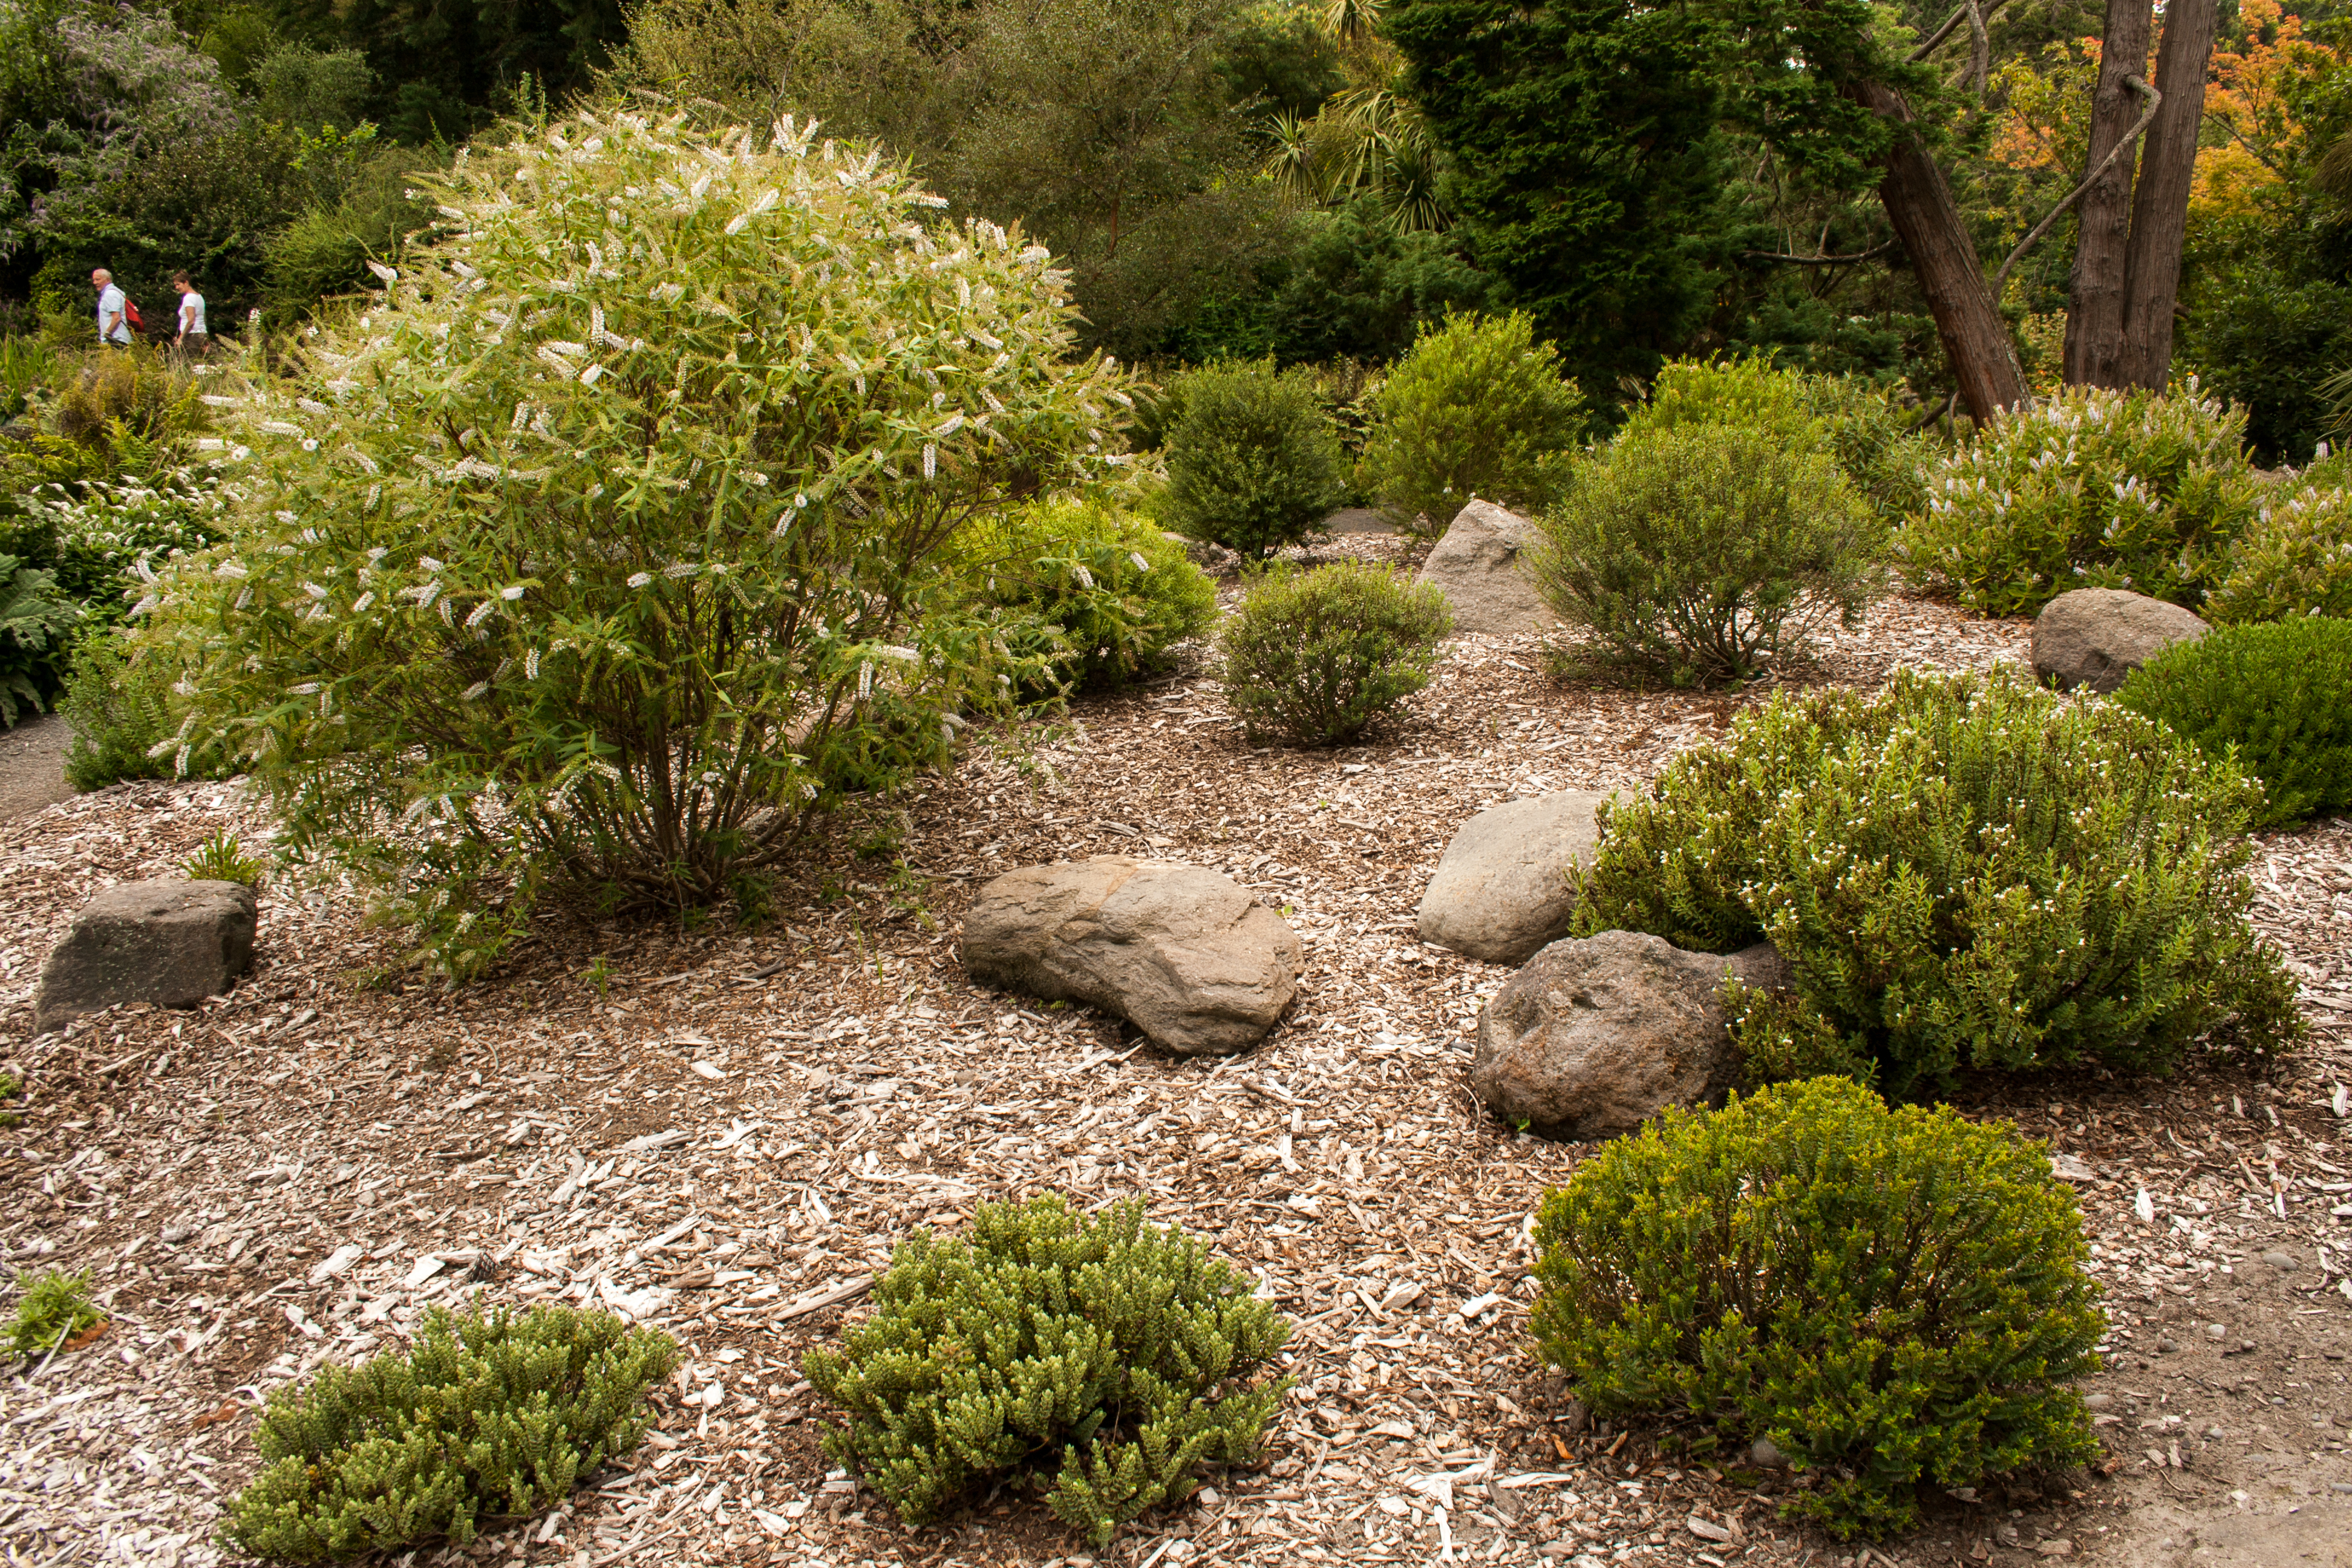 File:Christchurch Botanic Gardens, New Zealand Section, Hebes 2016 02 04